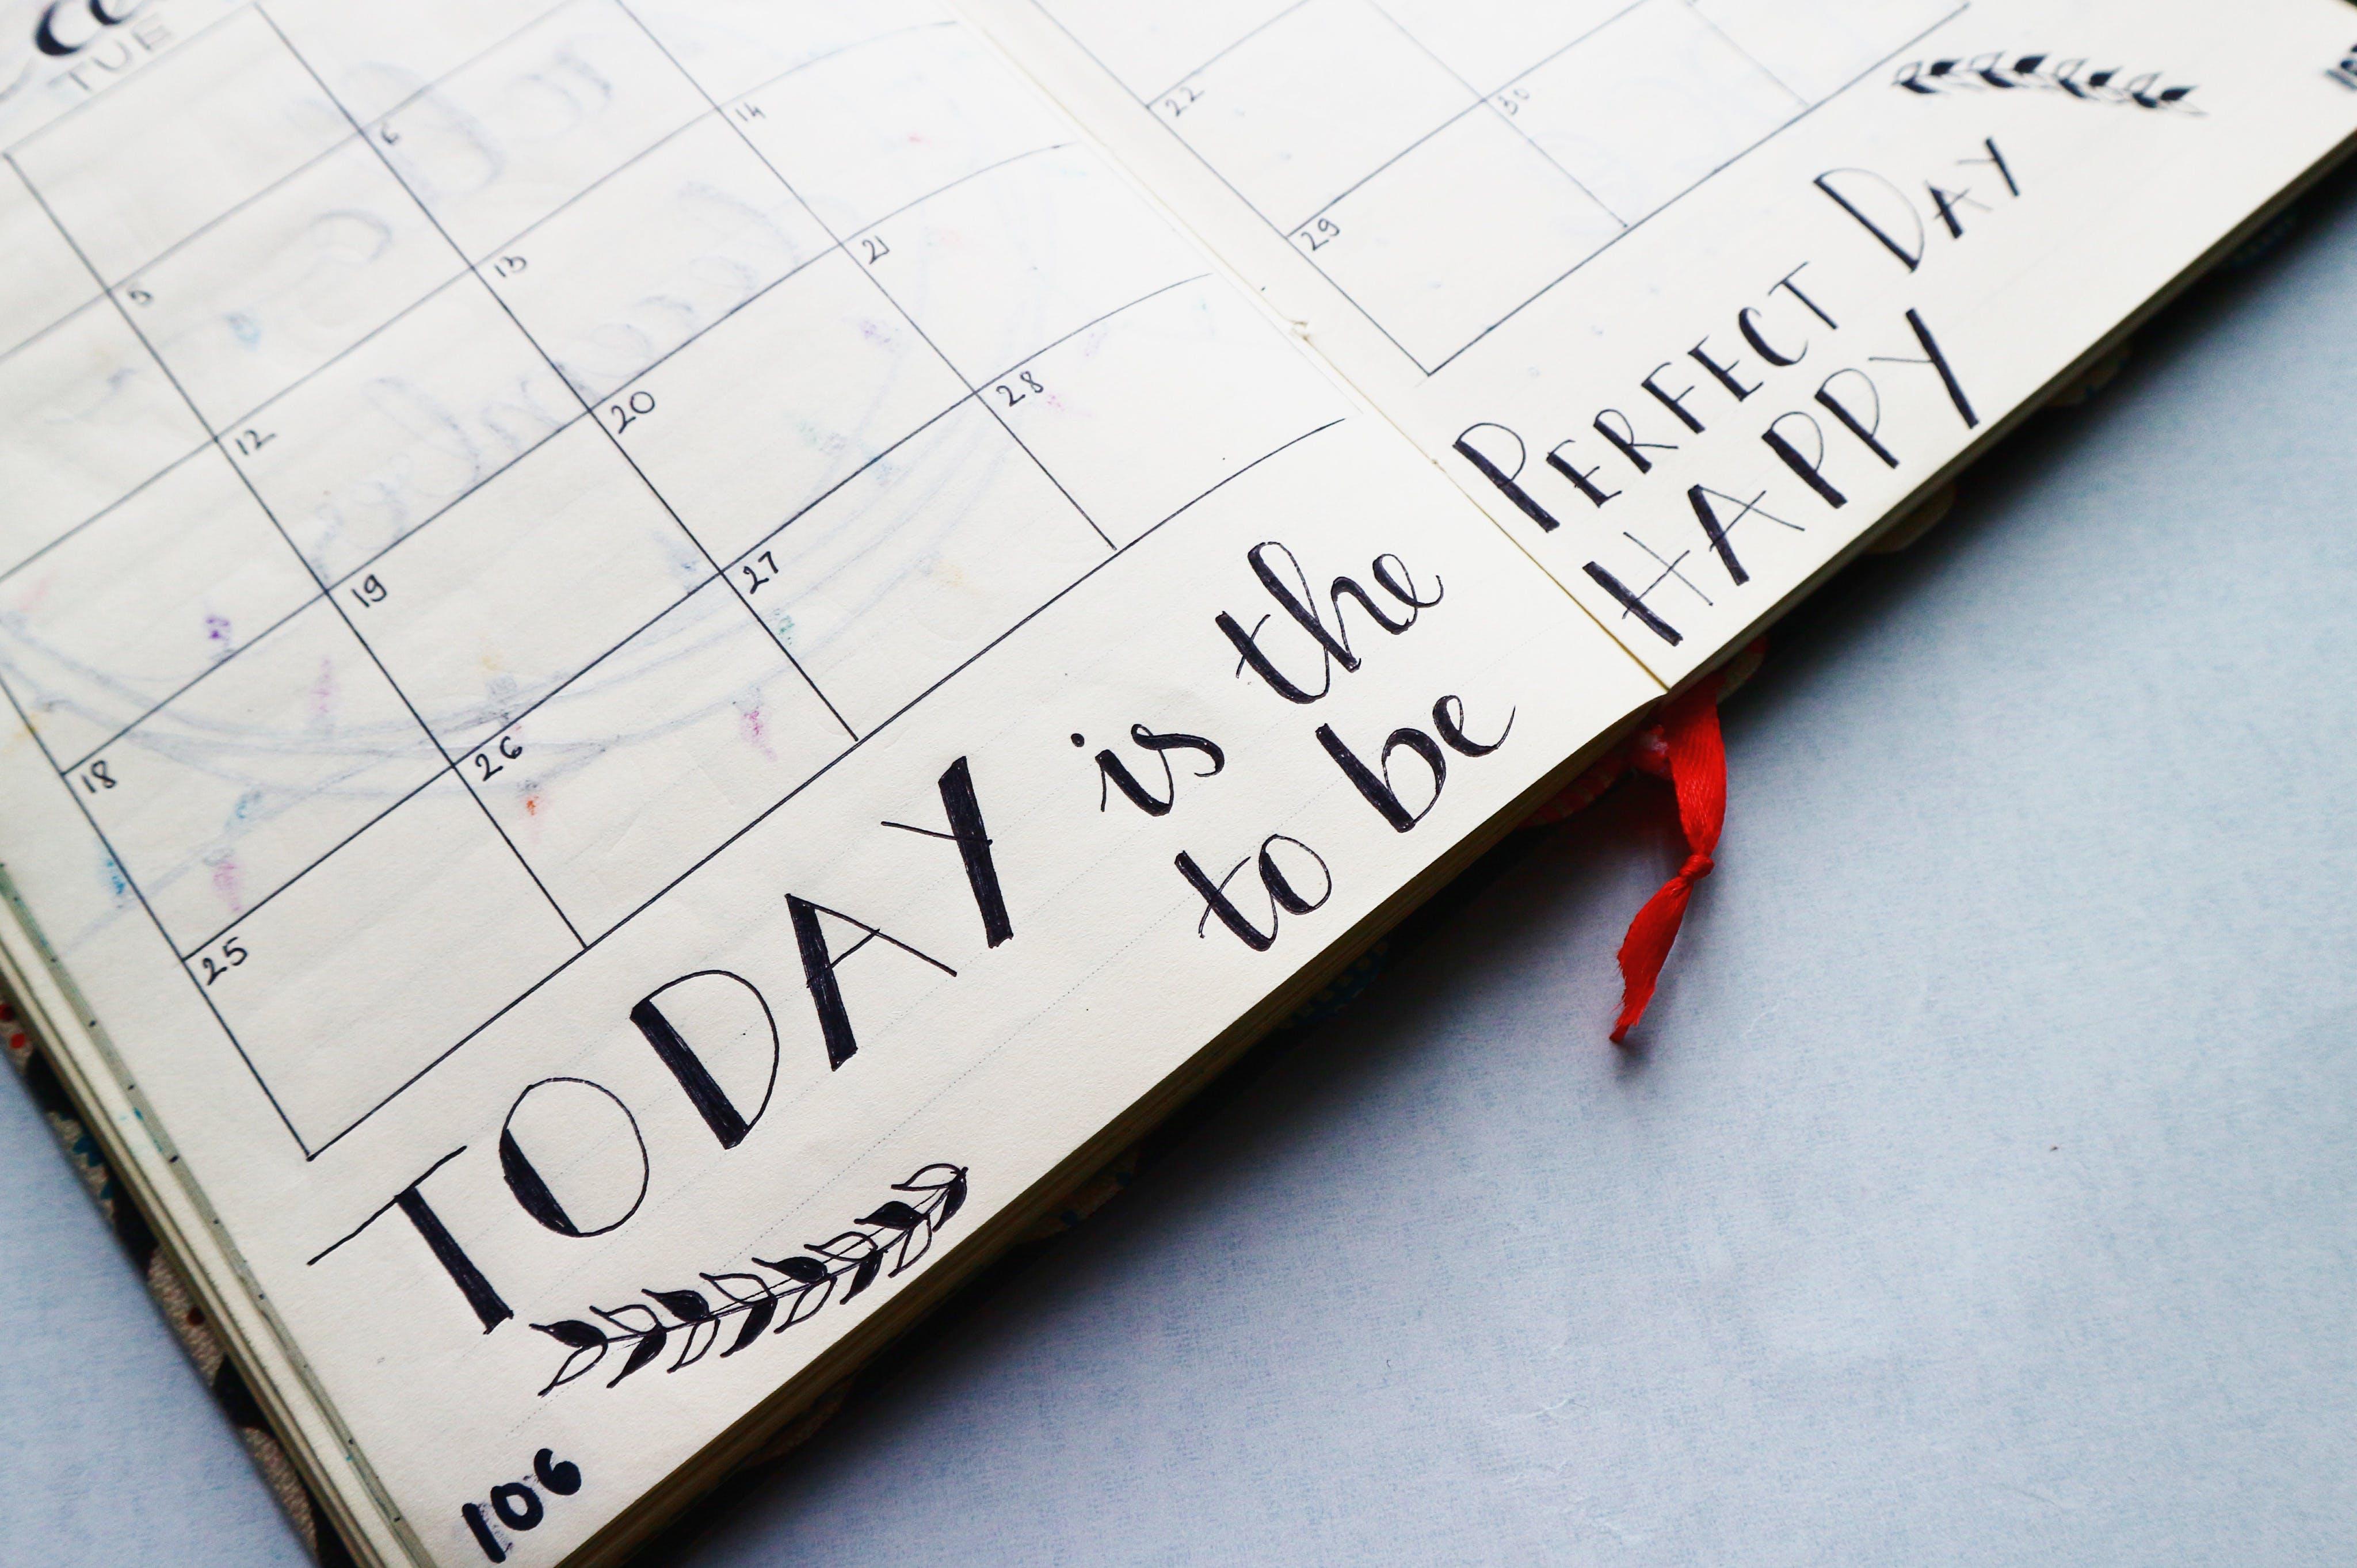 agenda, handschrift, kalender